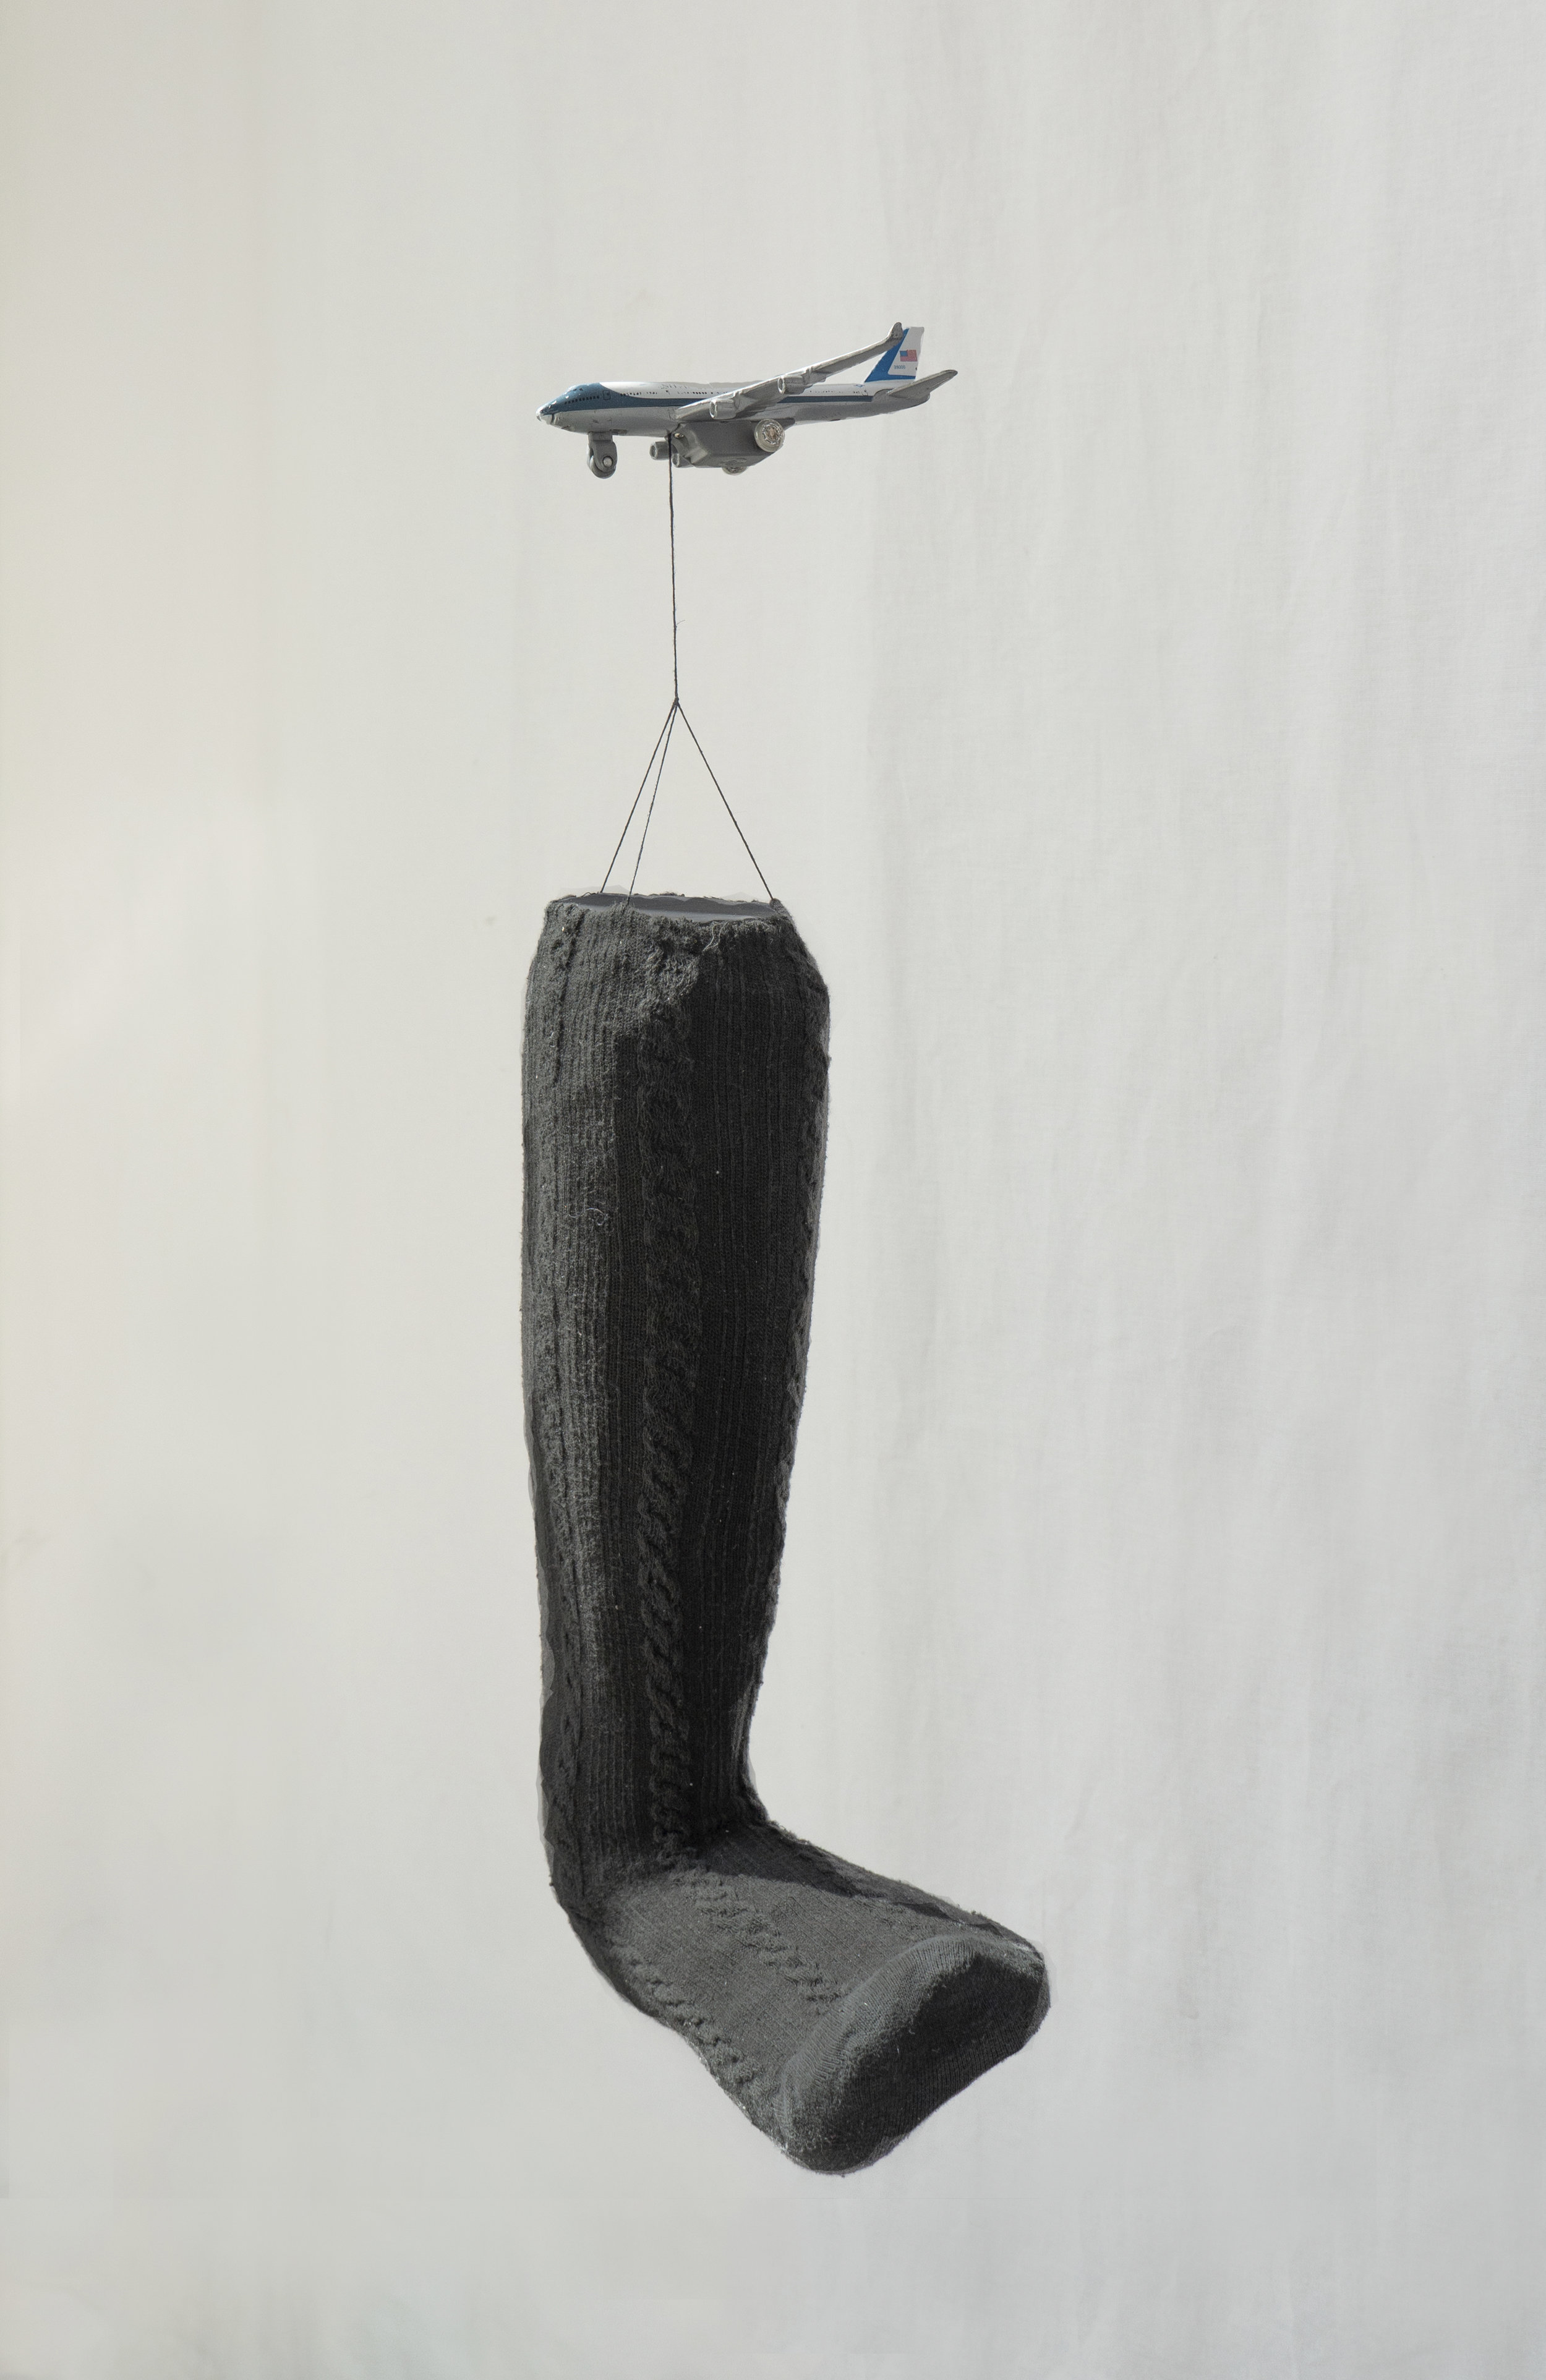 Nina Wiesnagrotzki,  Groovy Gait , 2018, Miniature airplane, string, sock, polystyrene